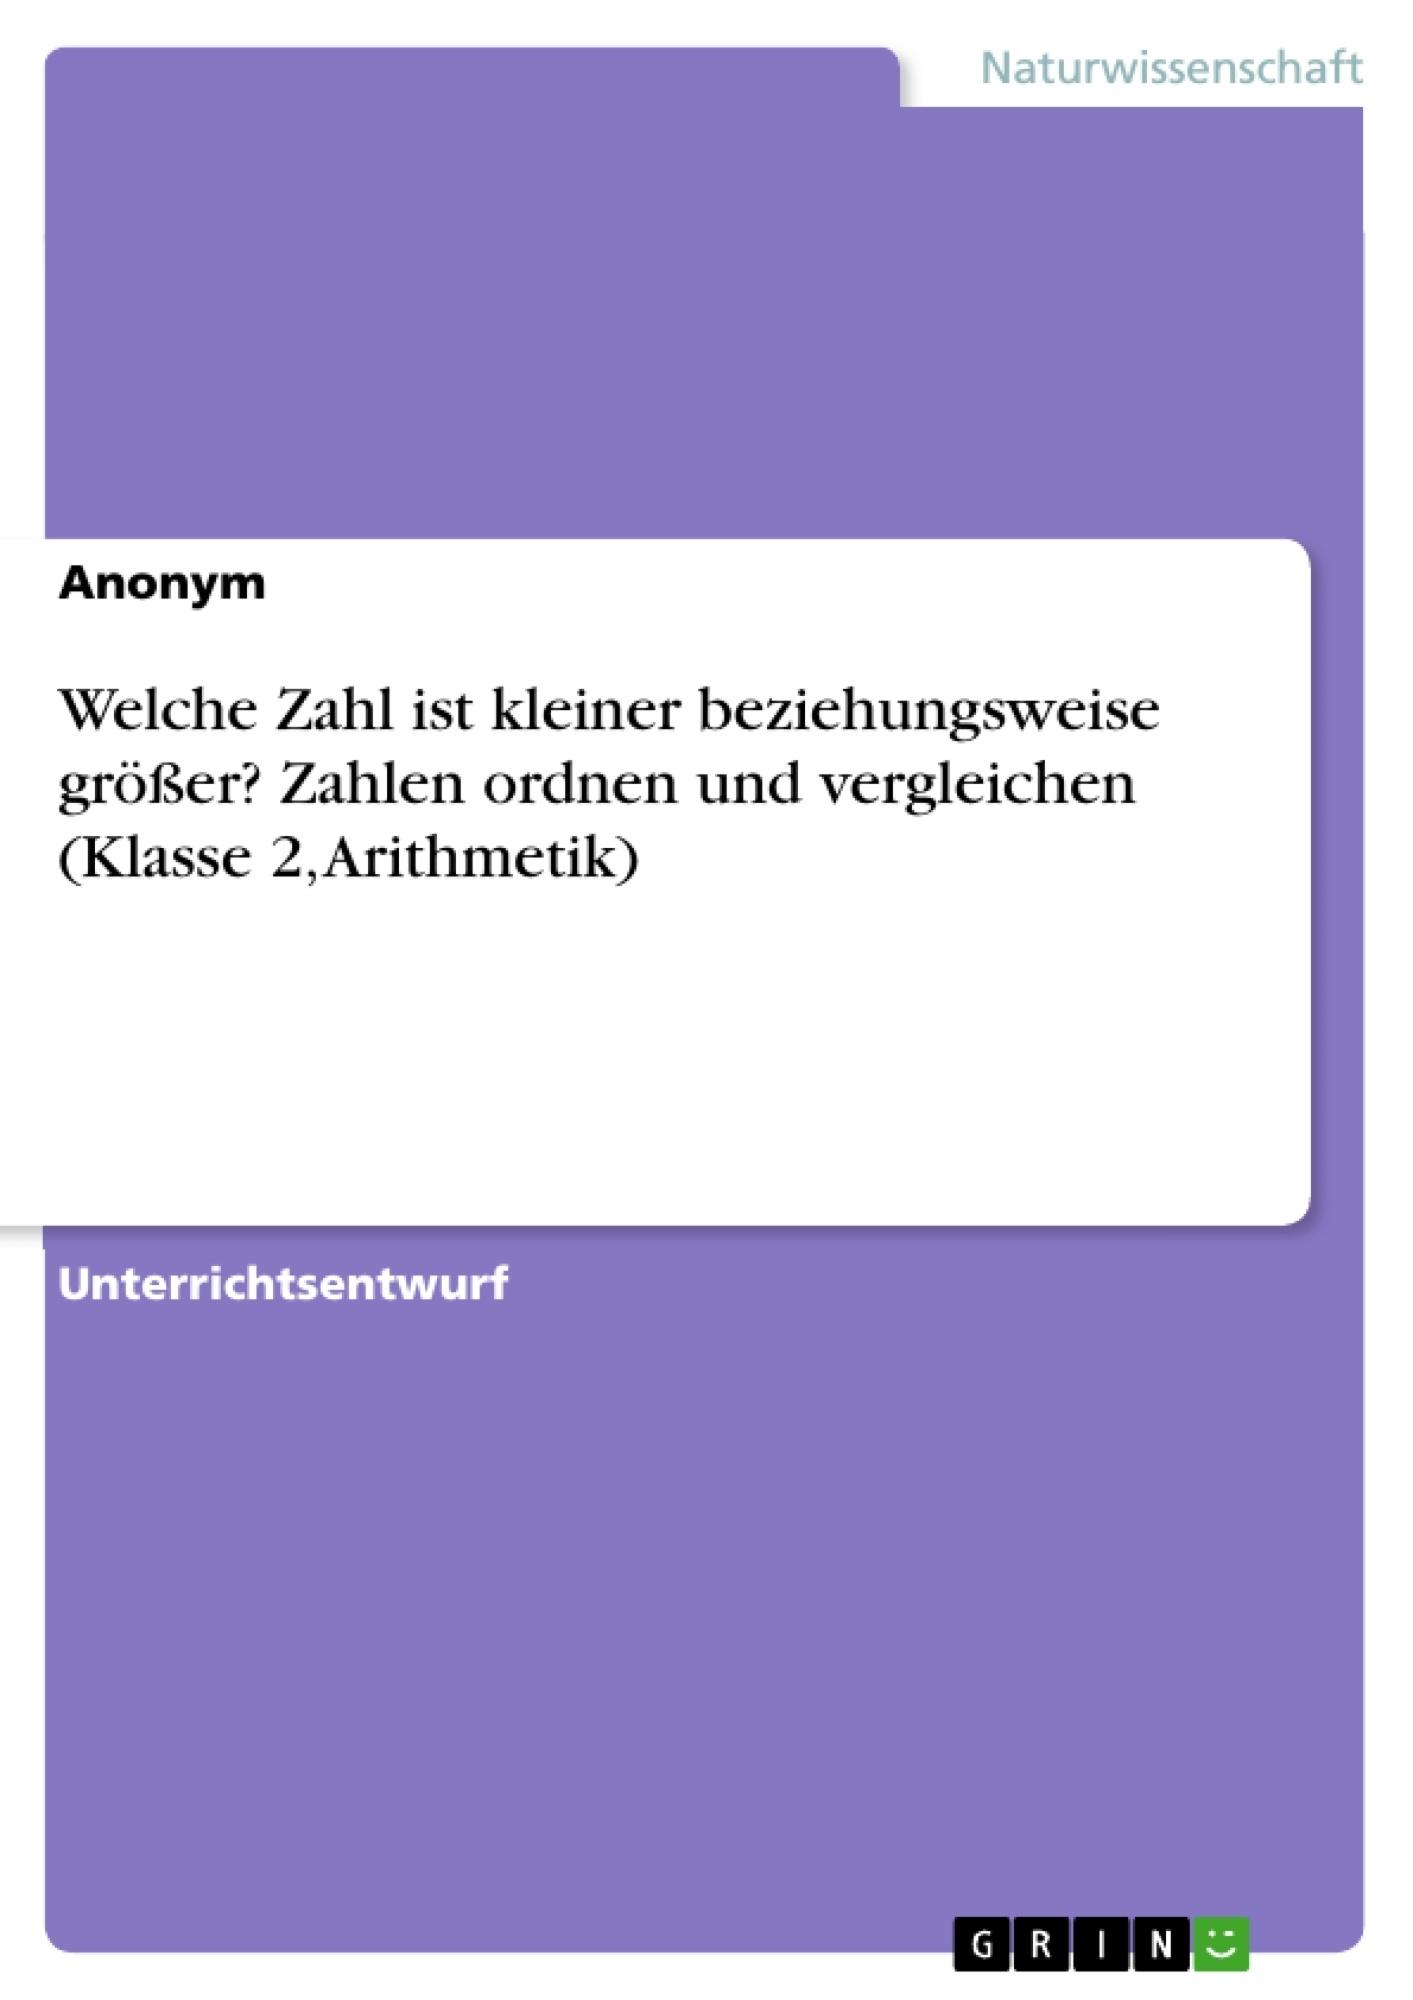 ... (je 1 Schachtel) komplett kostenlos bestellen/testen › Sparixx.de